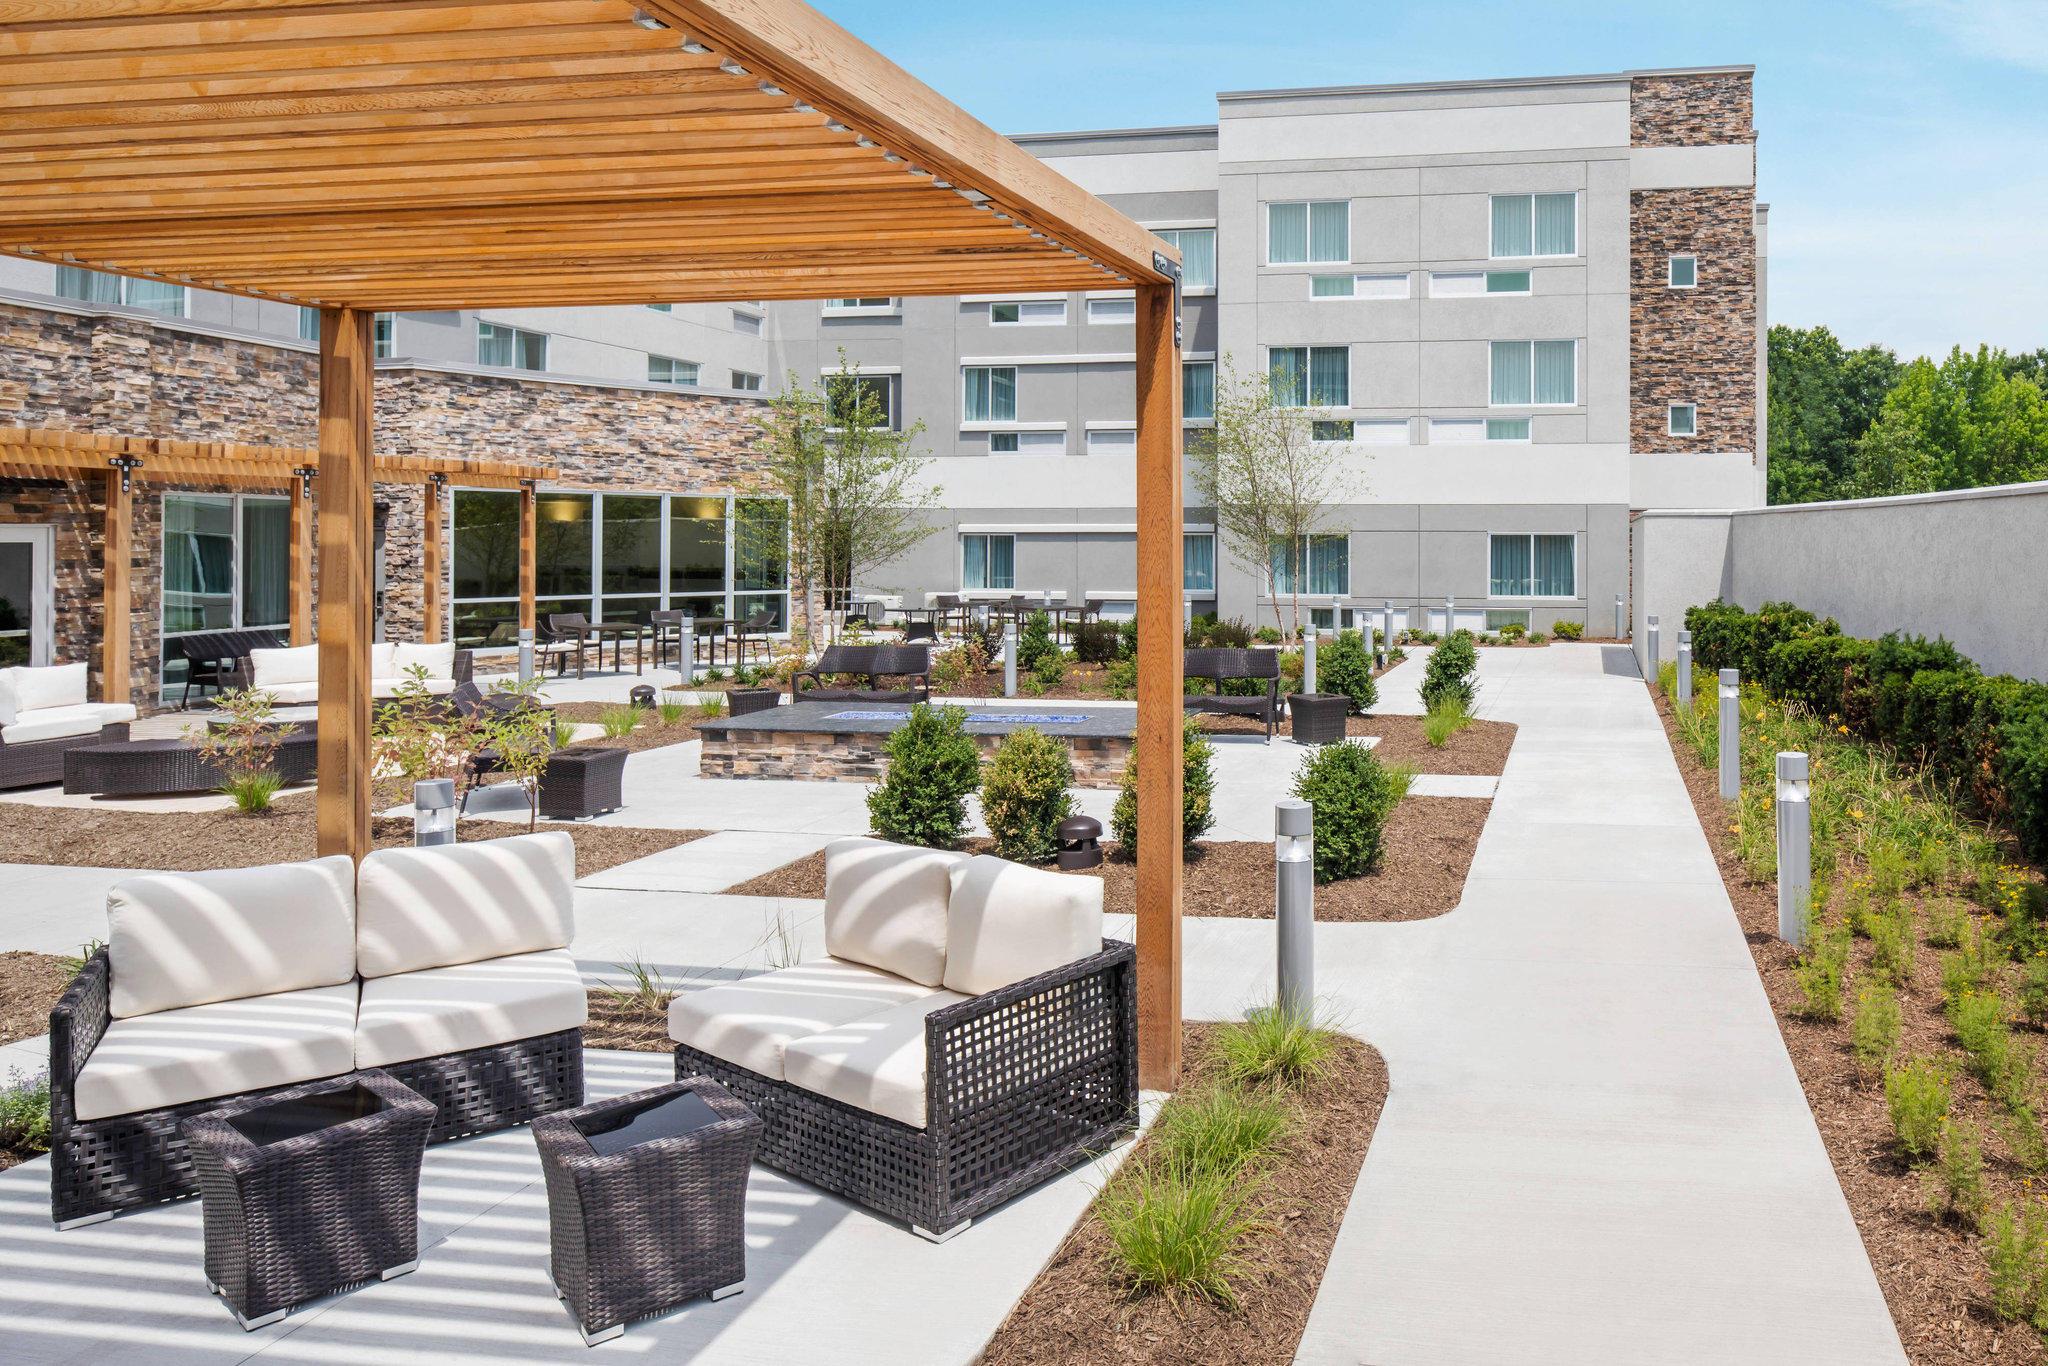 Courtyard by Marriott Wayne Fairfield